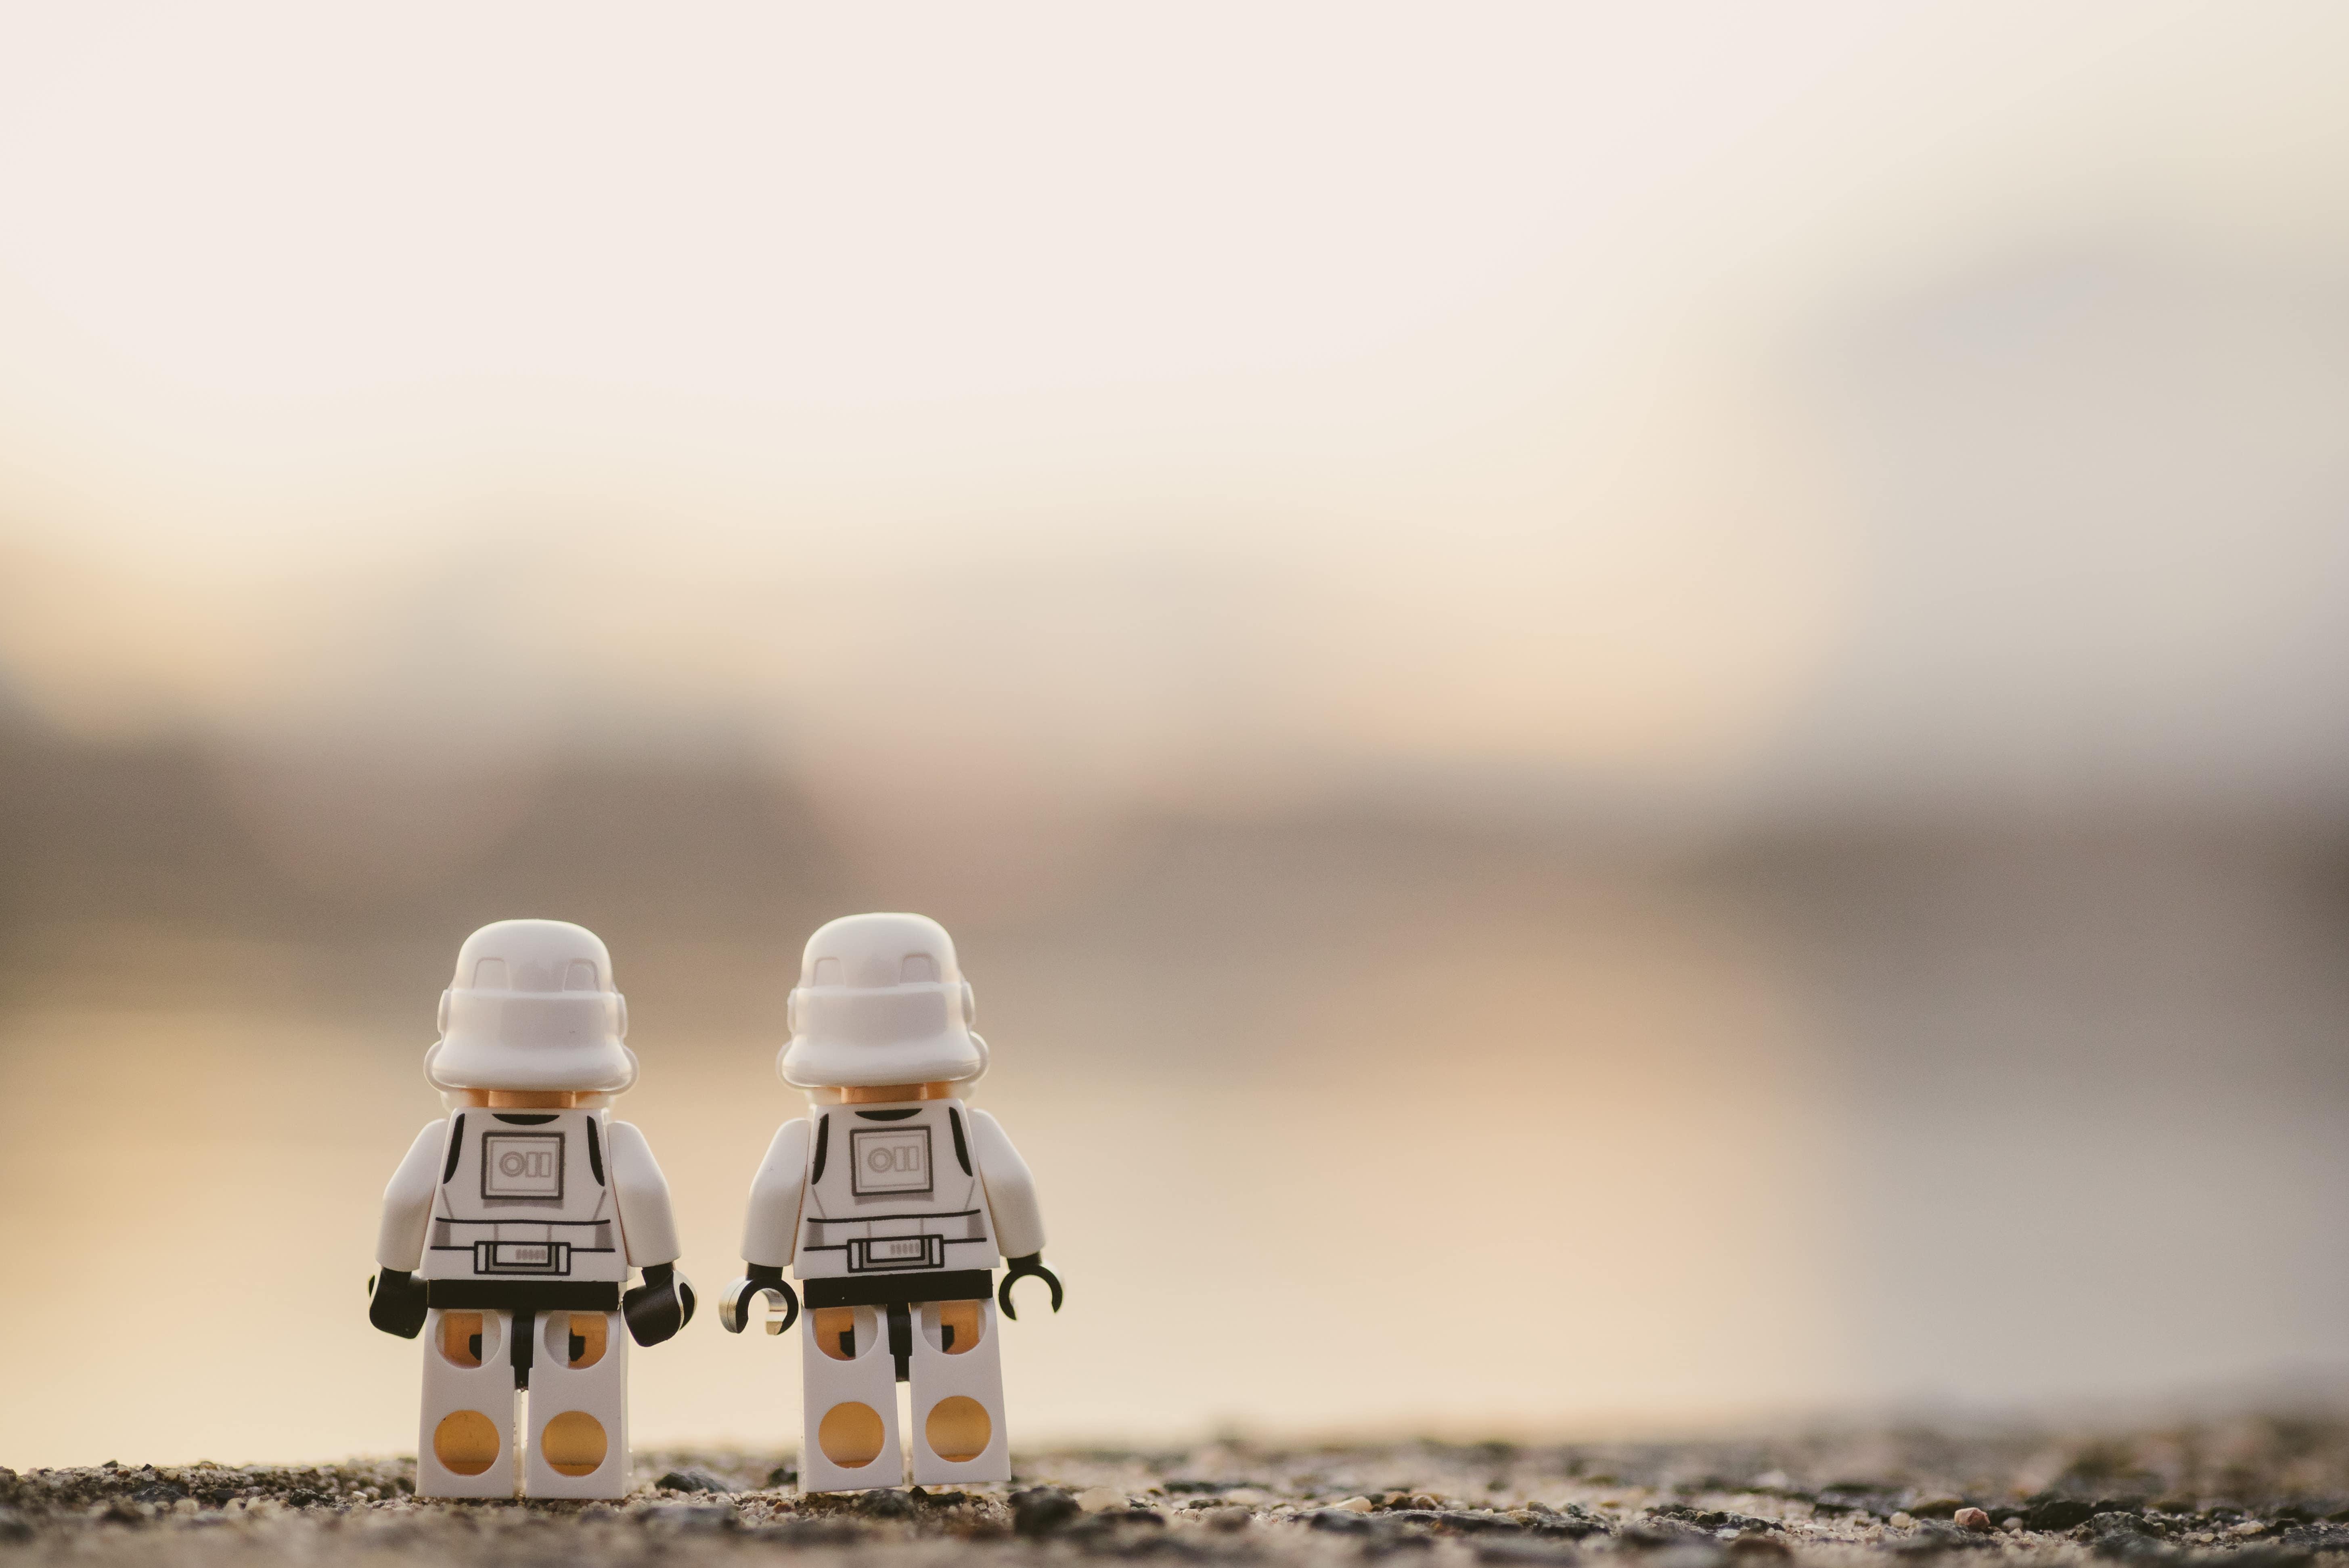 lego storm troopers gazing into horizon